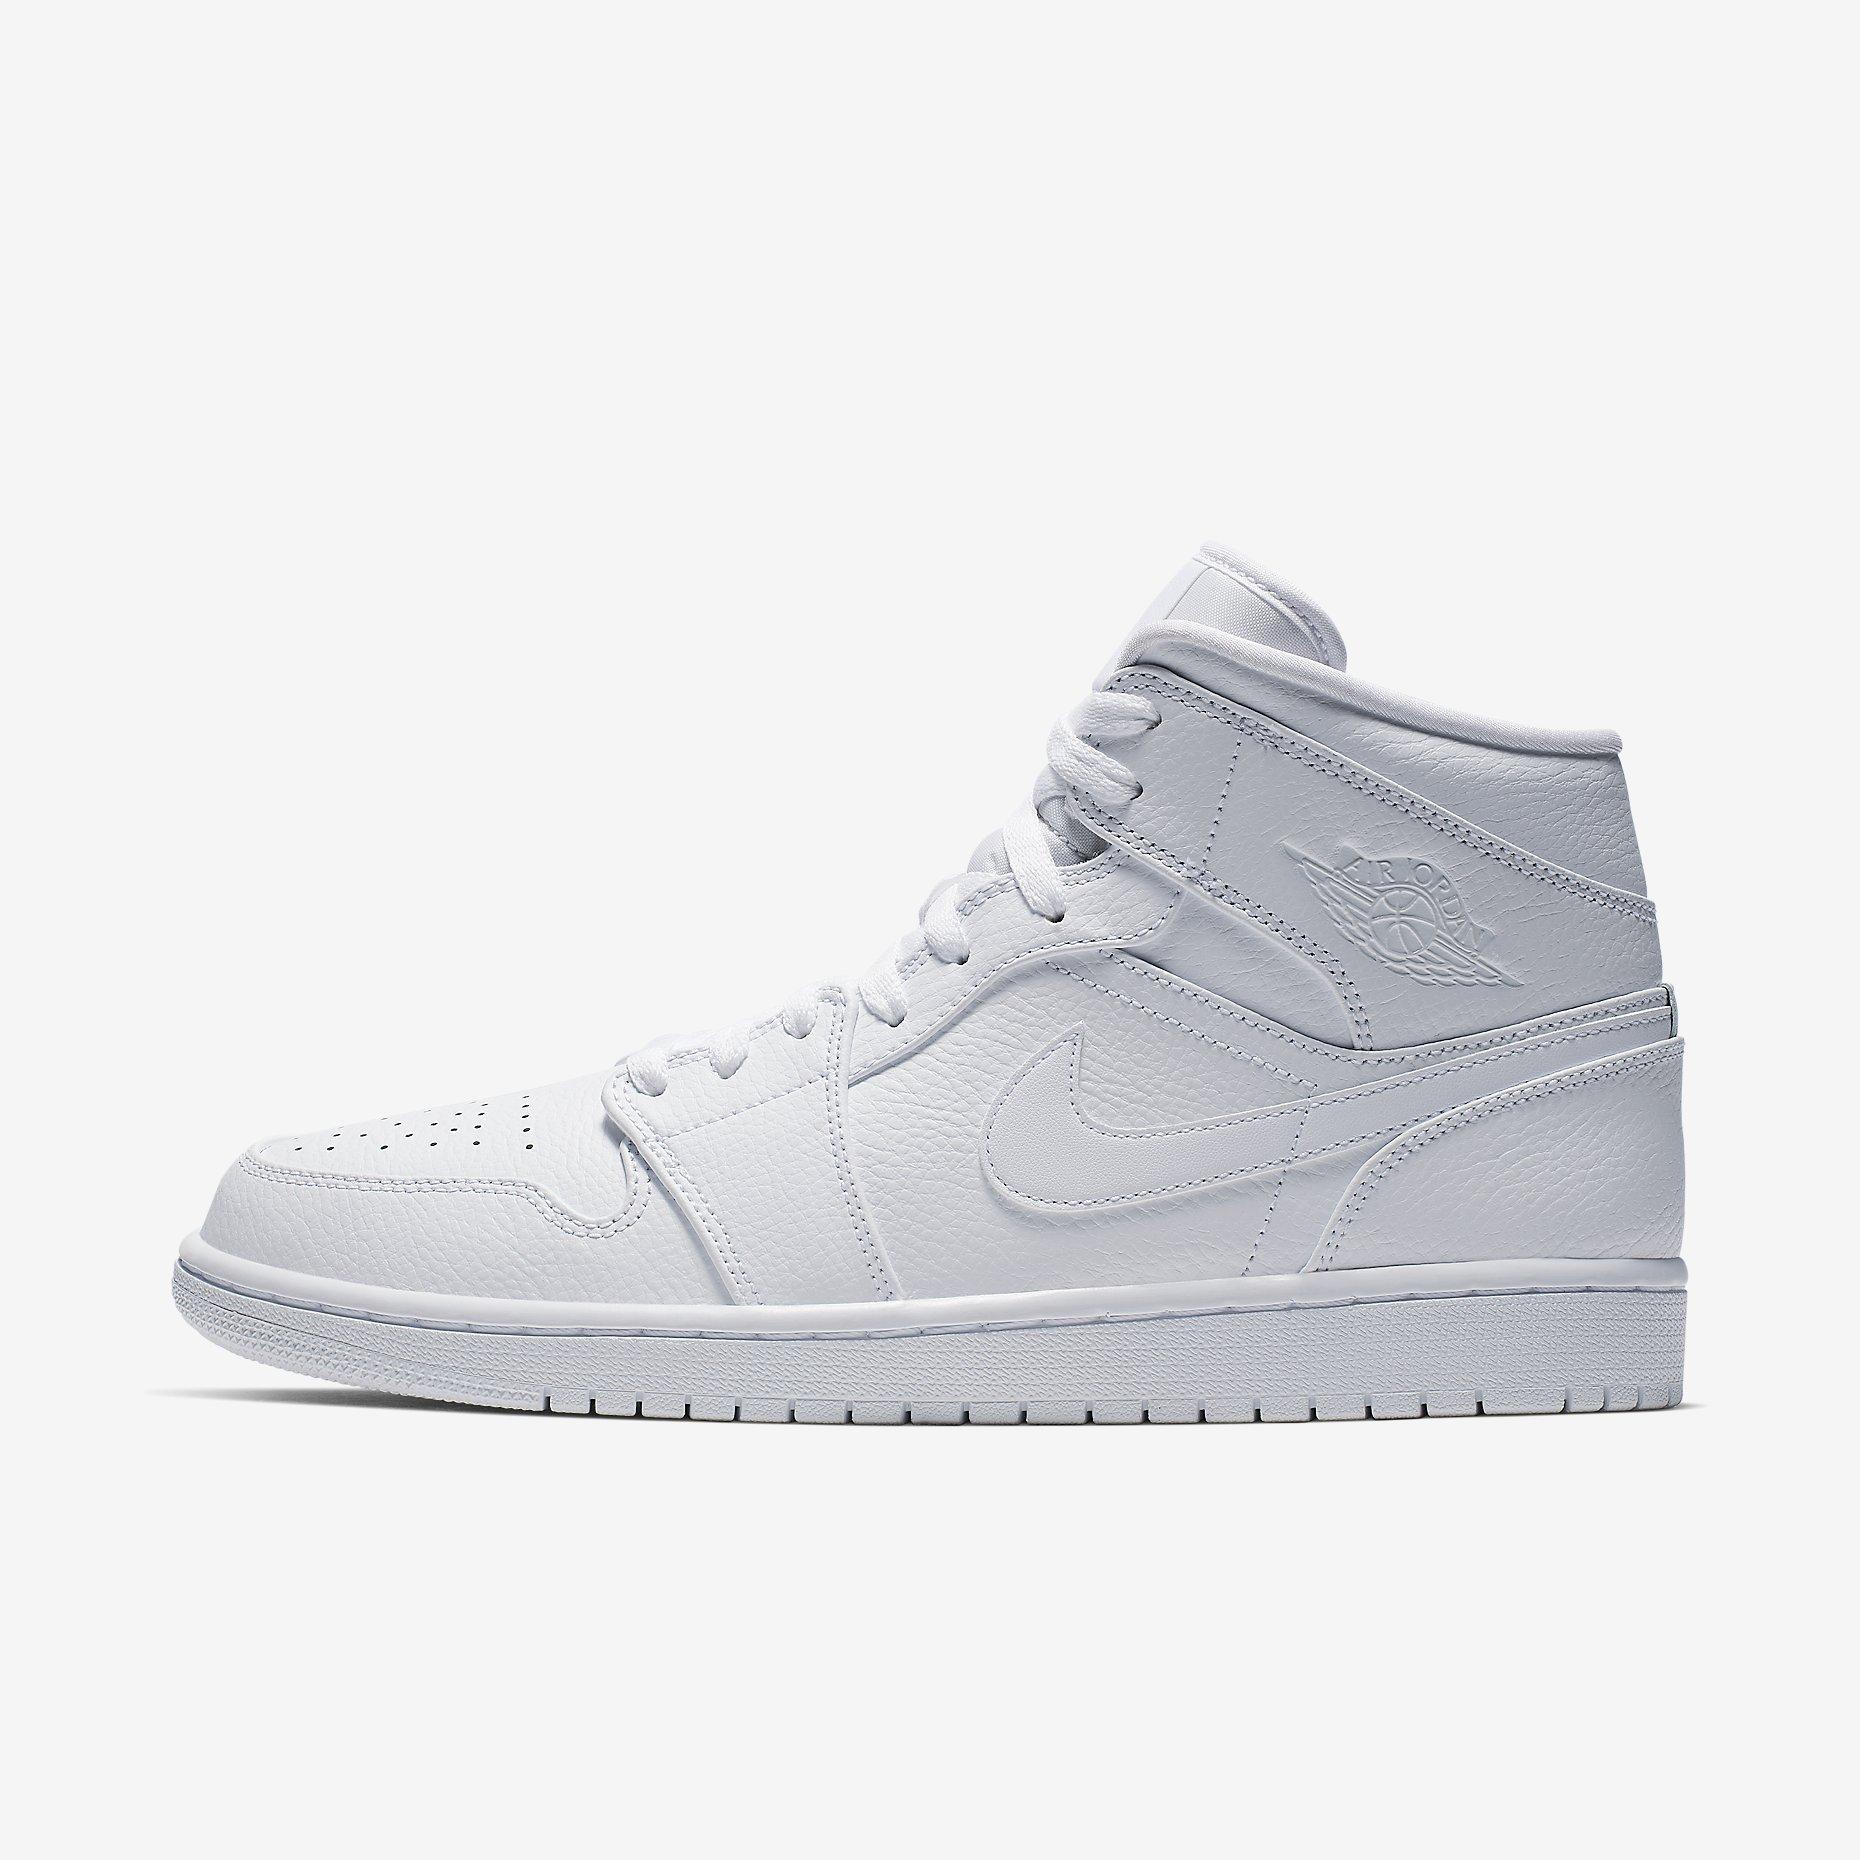 Air Jordan 1 Mid 'Triple White' 2.0 (2020)